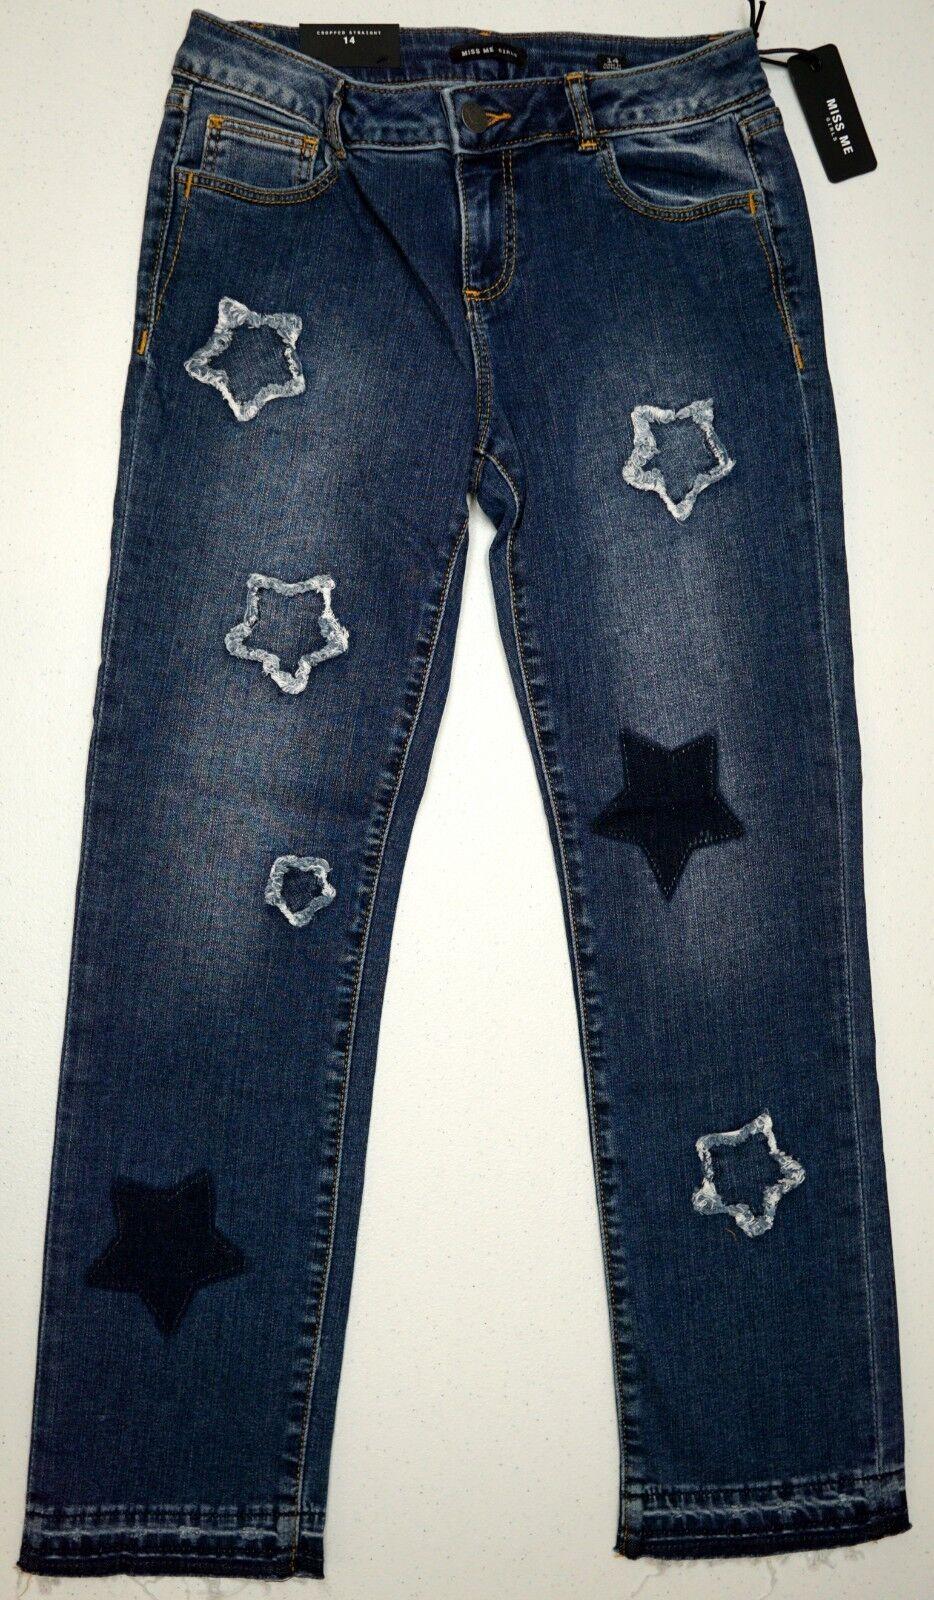 NWT  Miss Me Girls Jeans Cropped Straight Stretch Size 7 12 14 16 Denim Stars